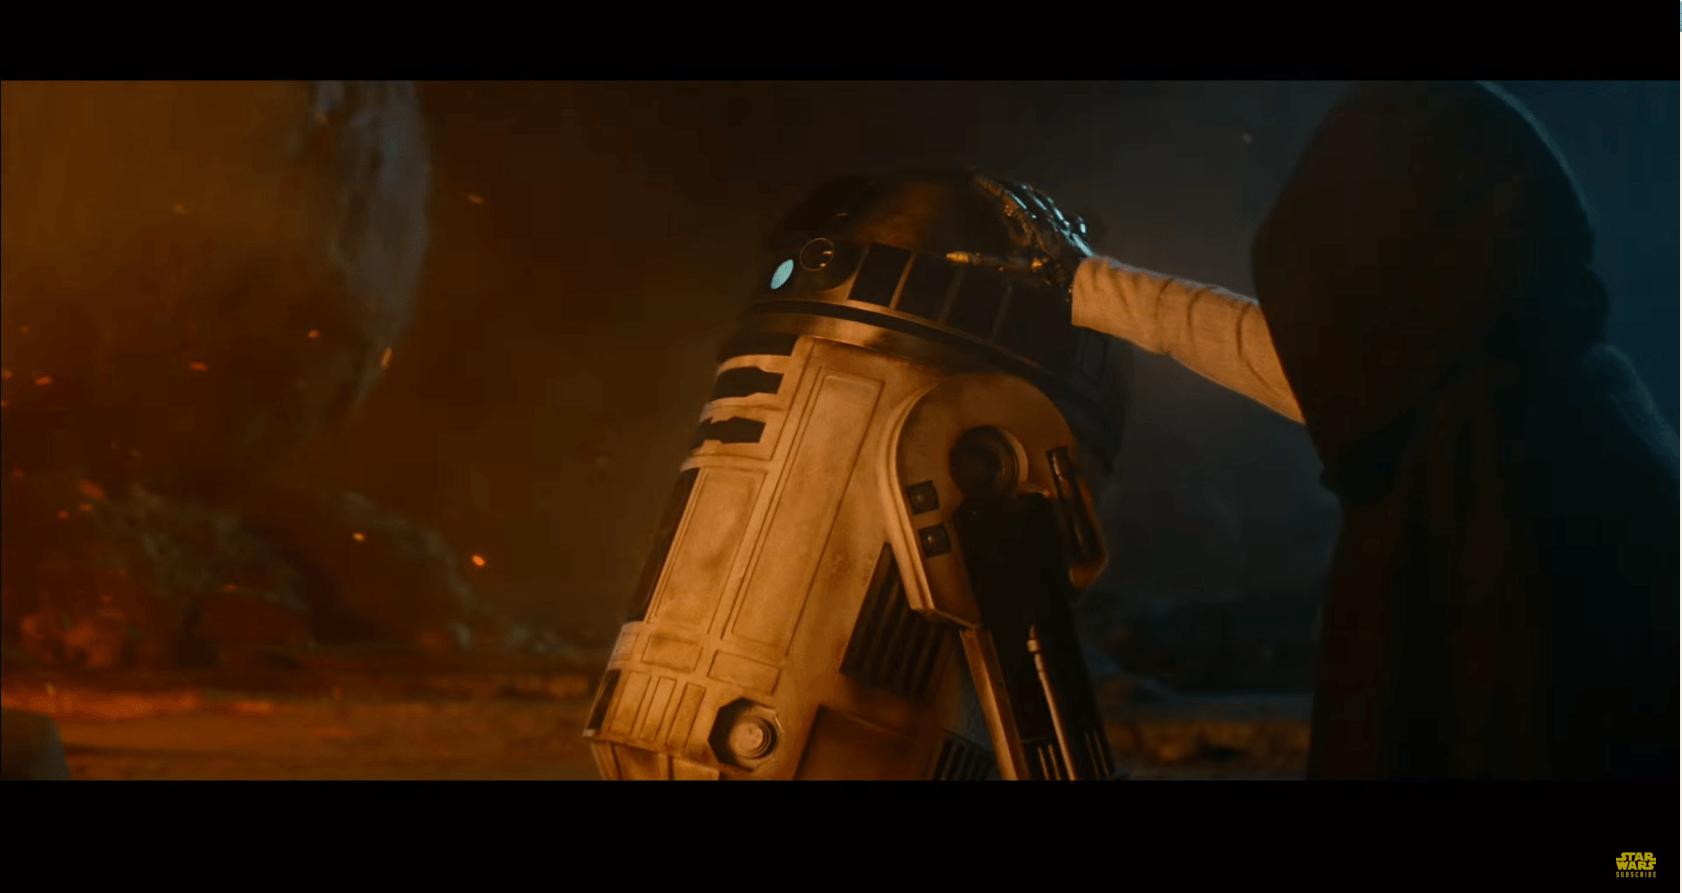 Still from Star Wars: The Force Awakens Trailer